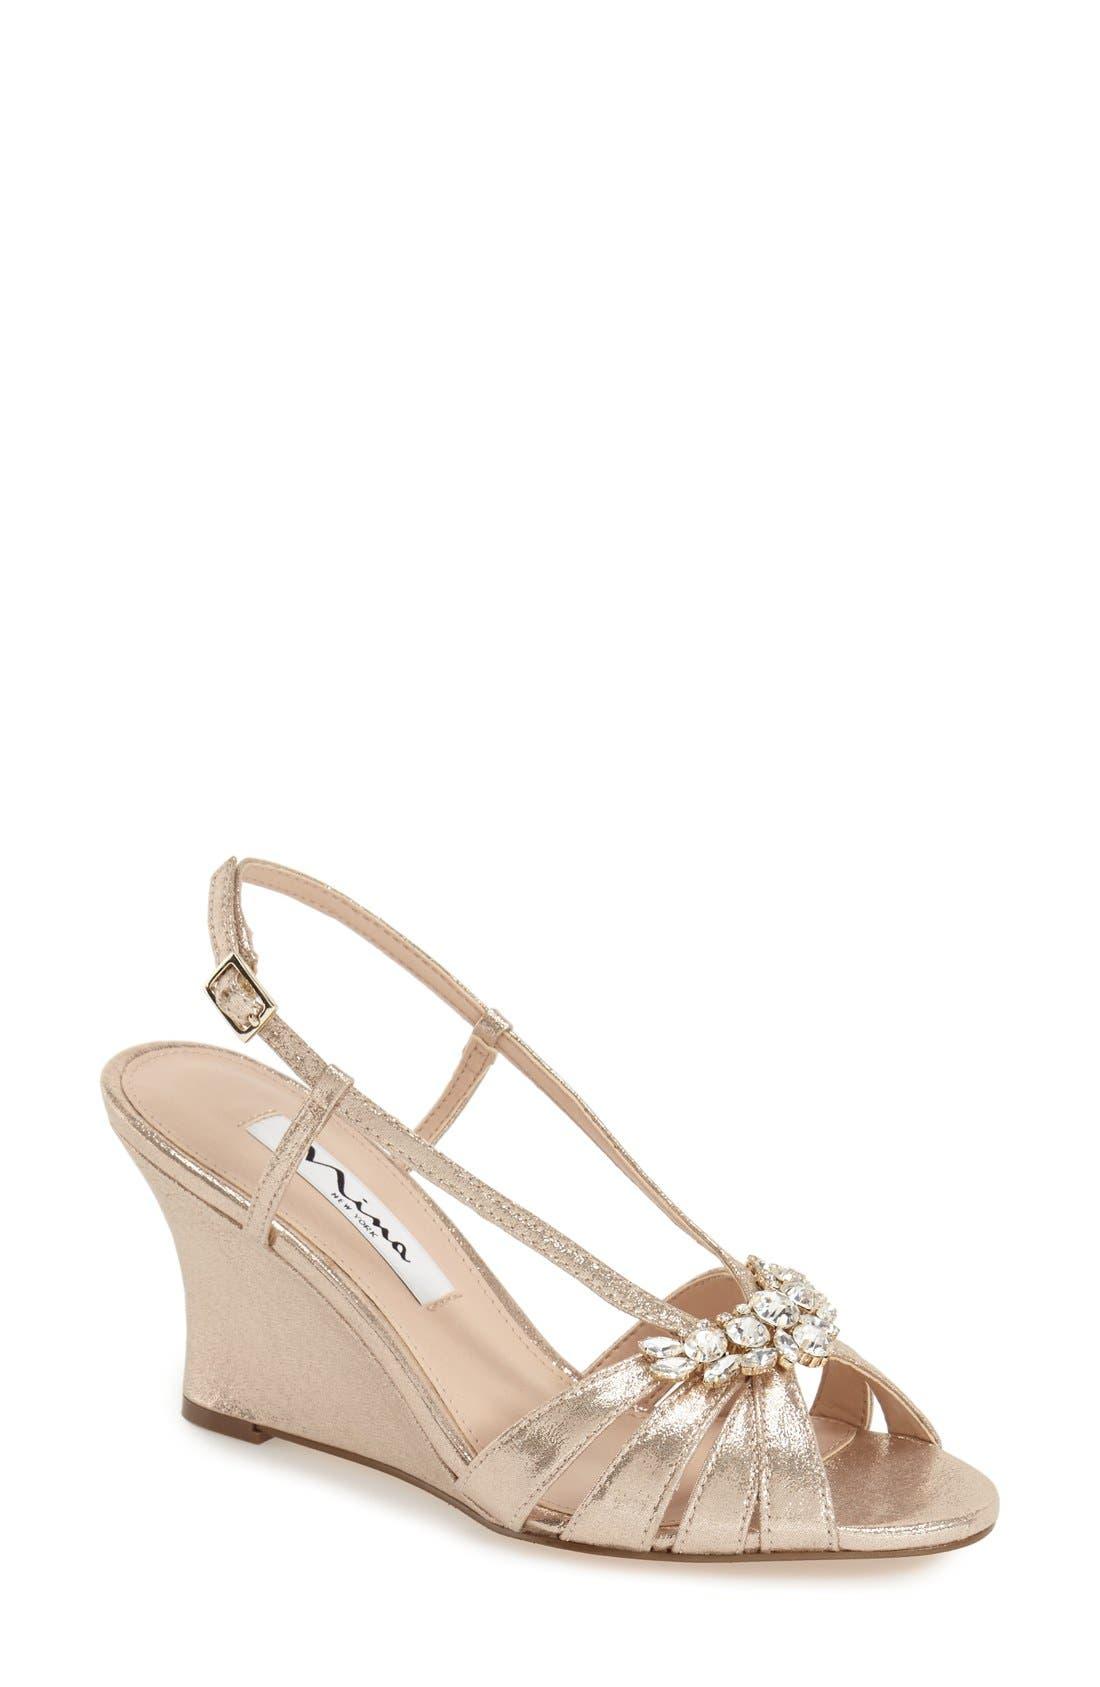 'Voleta' Wedge Sandal,                         Main,                         color, Taupe